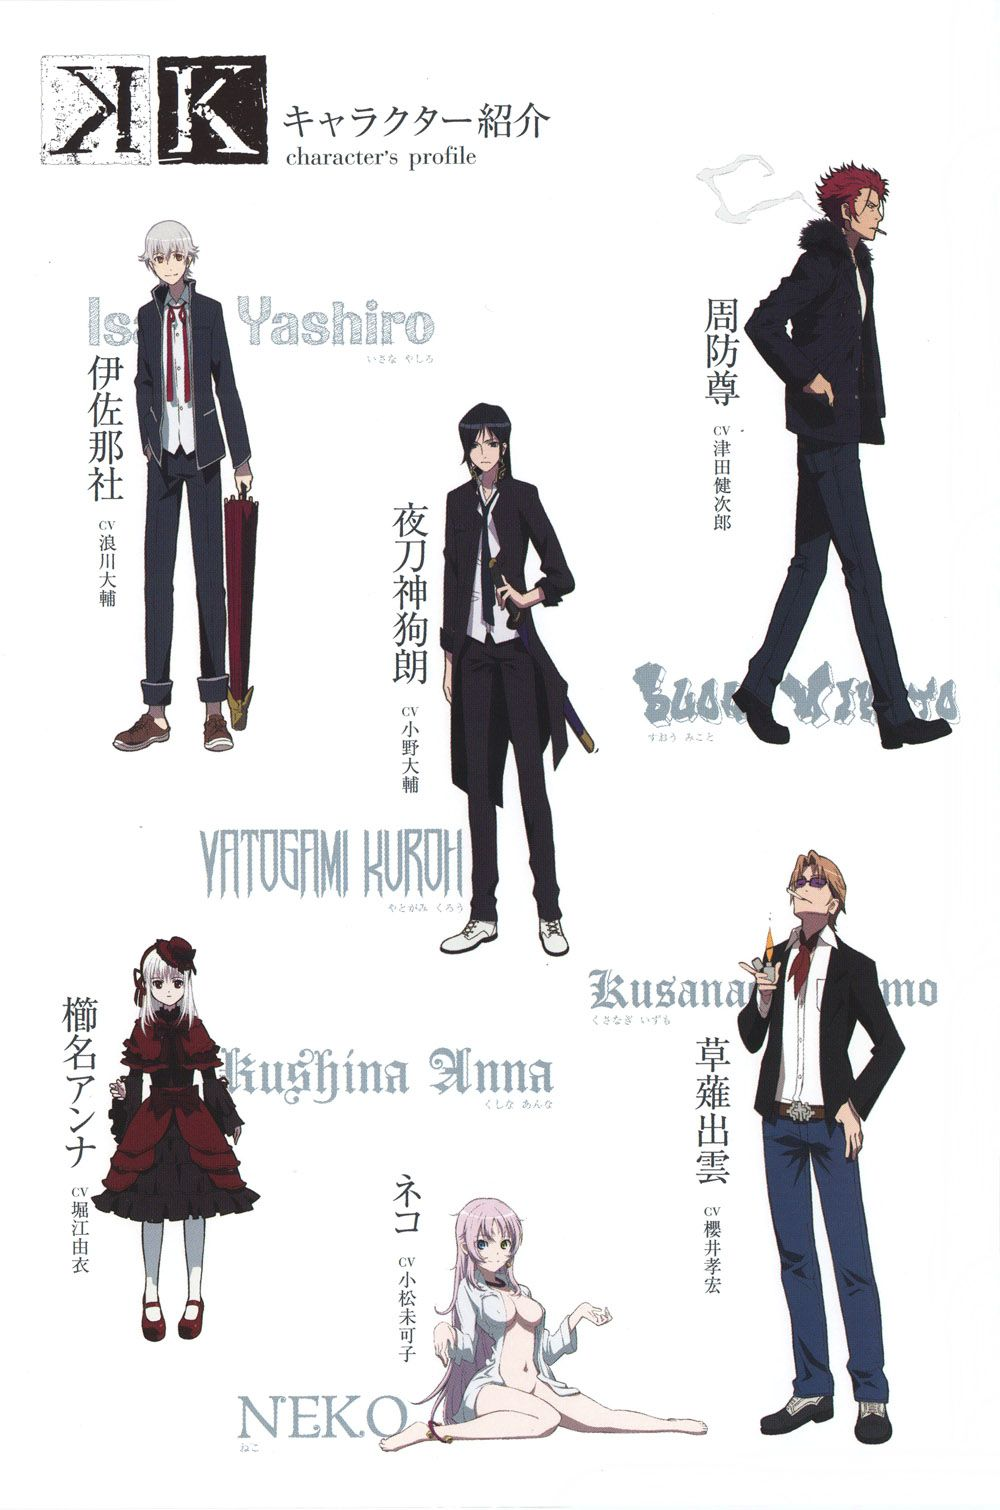 Tags scan character sheet official art isana yashiro k project yatogami kuroh suoh mikoto kusanagi izumo kushina anna neko k project